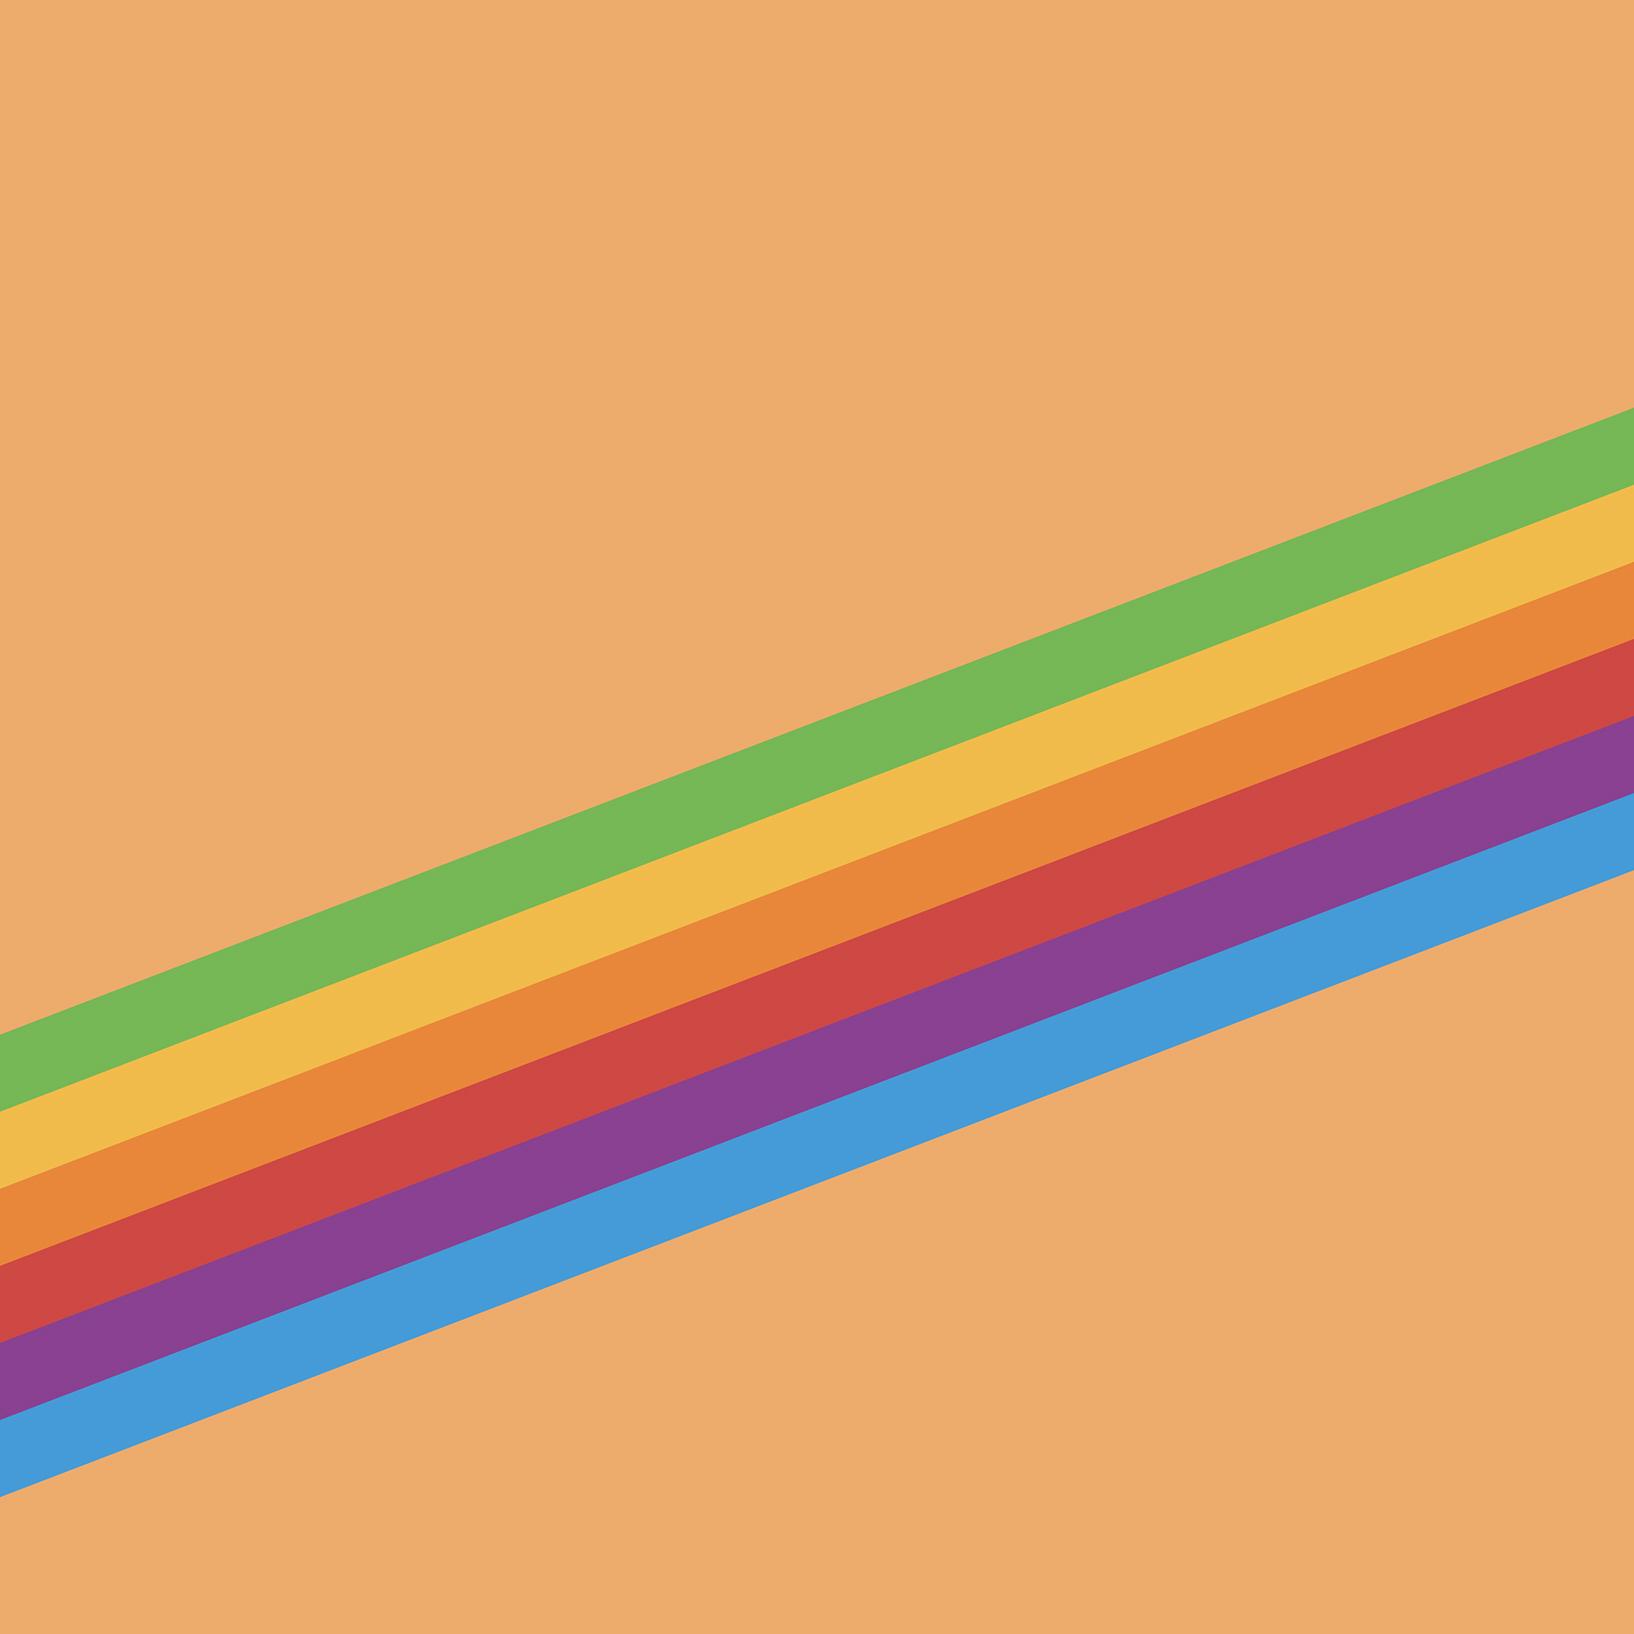 Ios 11 Gm Wallpaper Heritage Stripe Orange